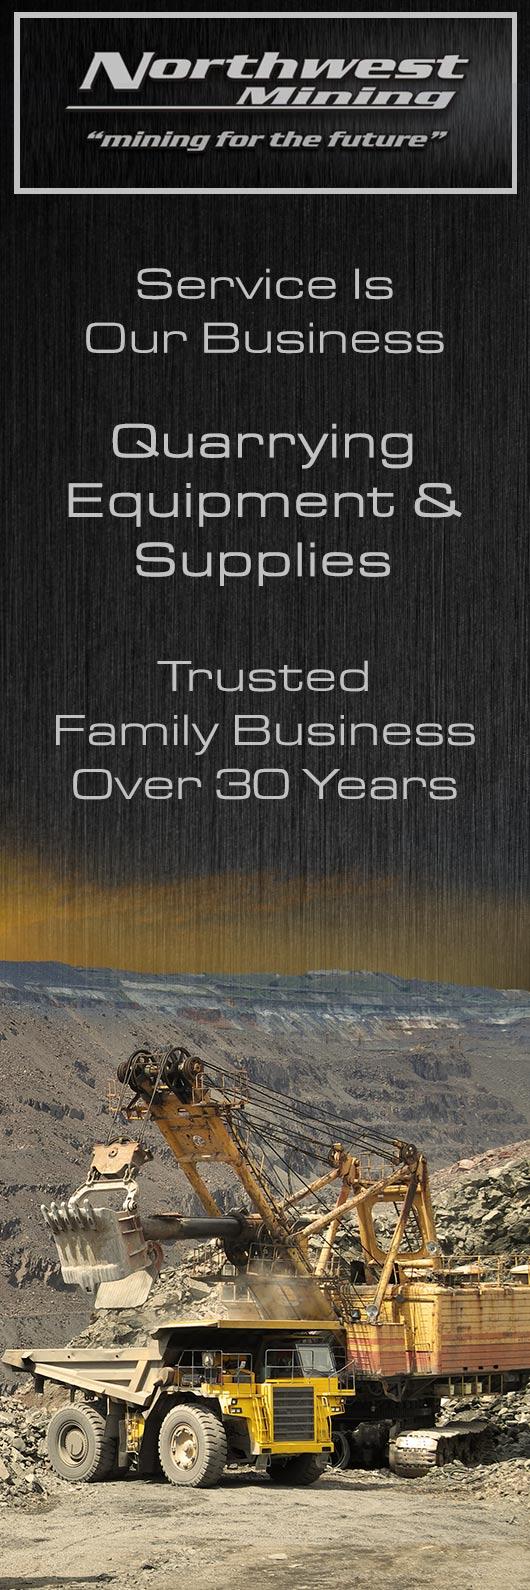 Northwest Mining - Mining, Quarrying Equipment & Supplies